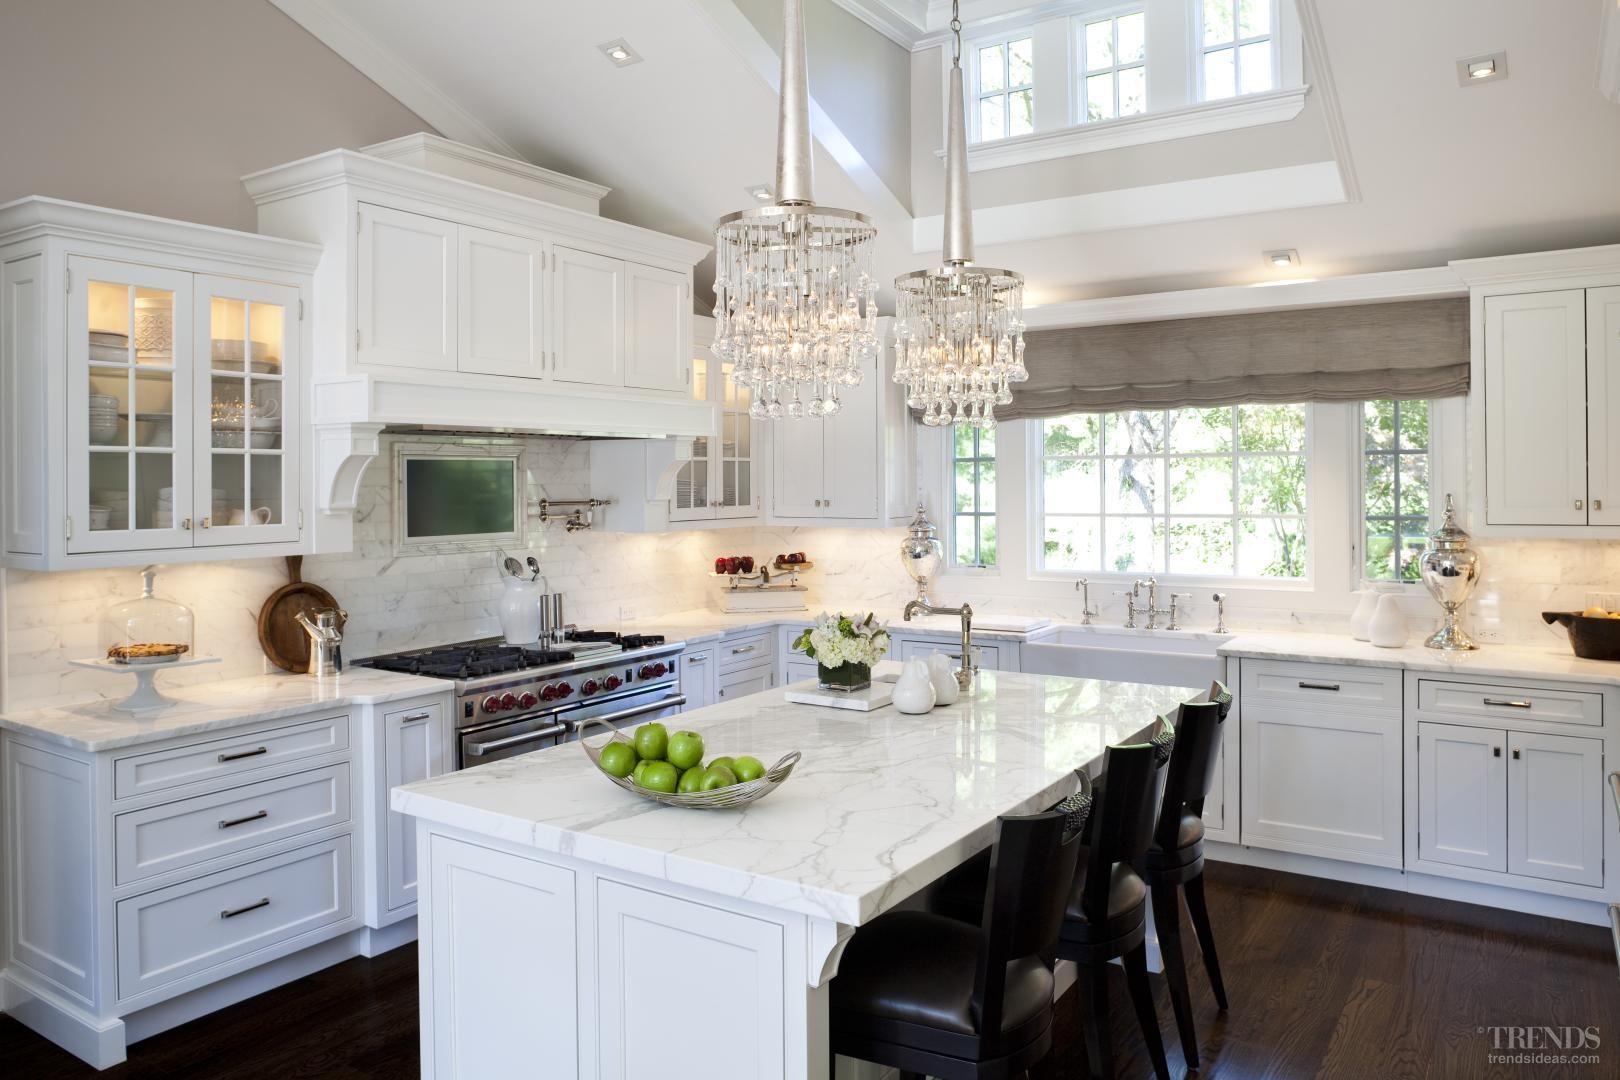 Glamor White Kitchen By Iris Dankner Kitchen Design